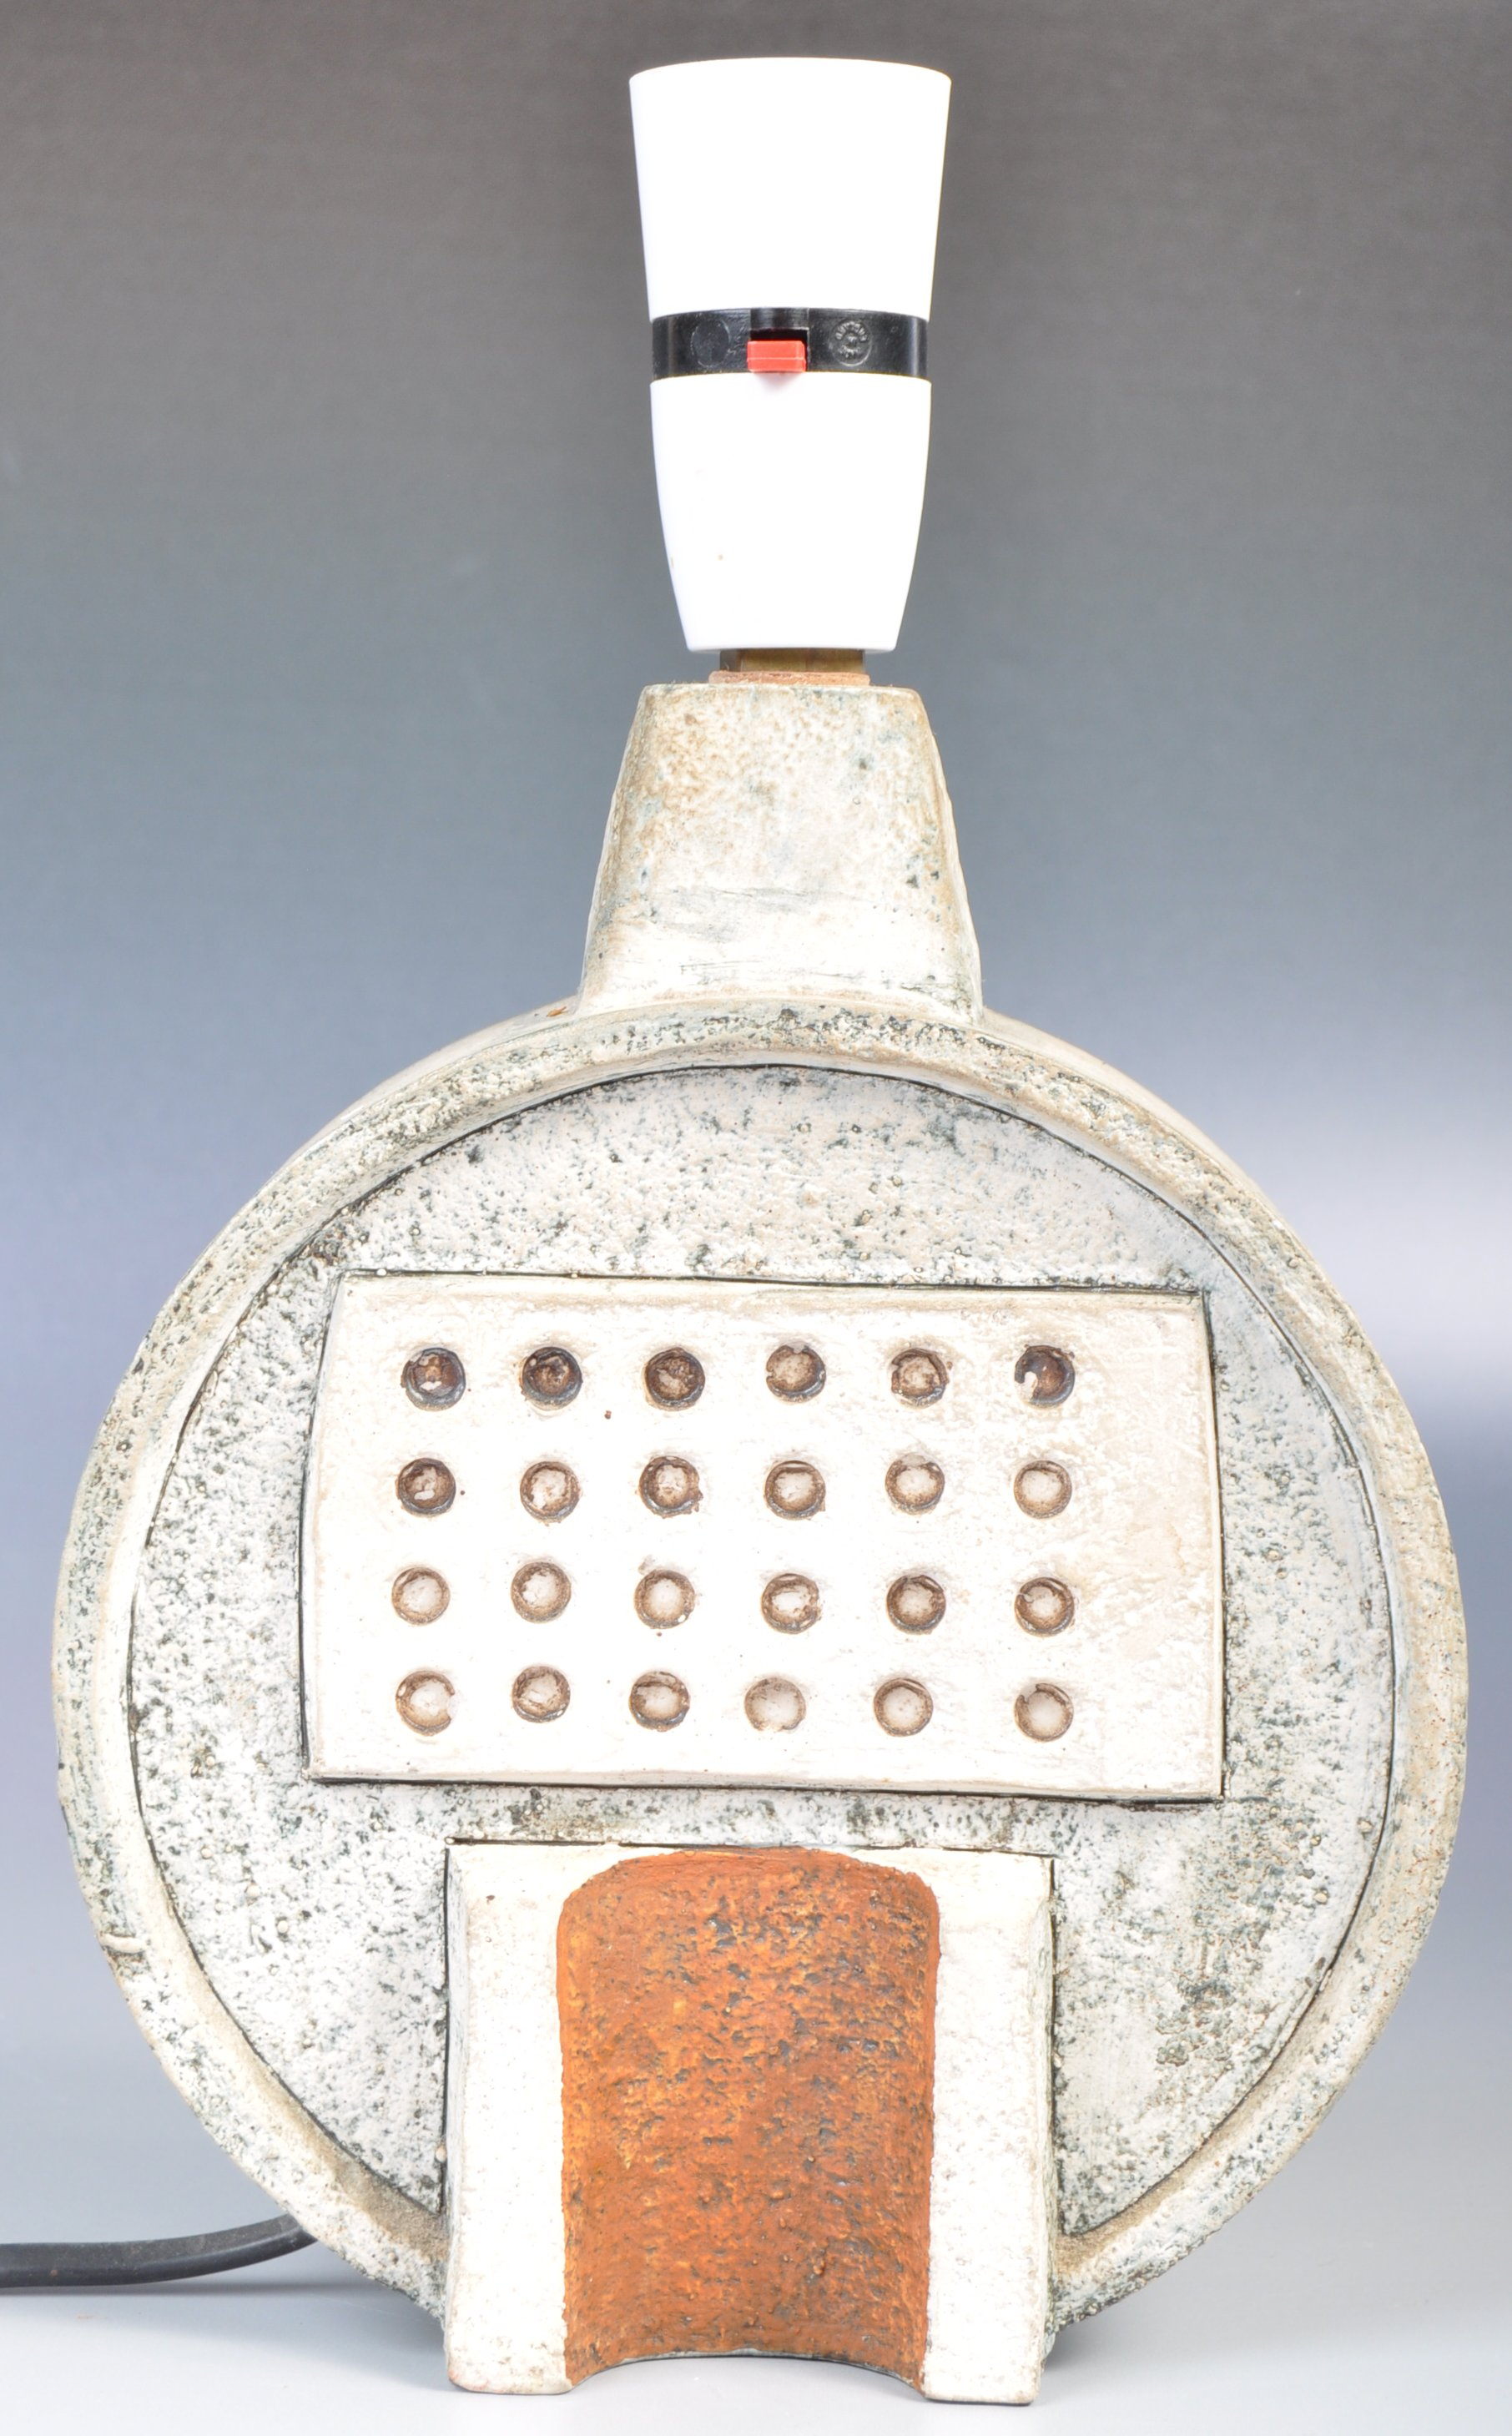 SIMONE KILBURN WHEEL VASE LAMP BY TROIKA - Image 4 of 6